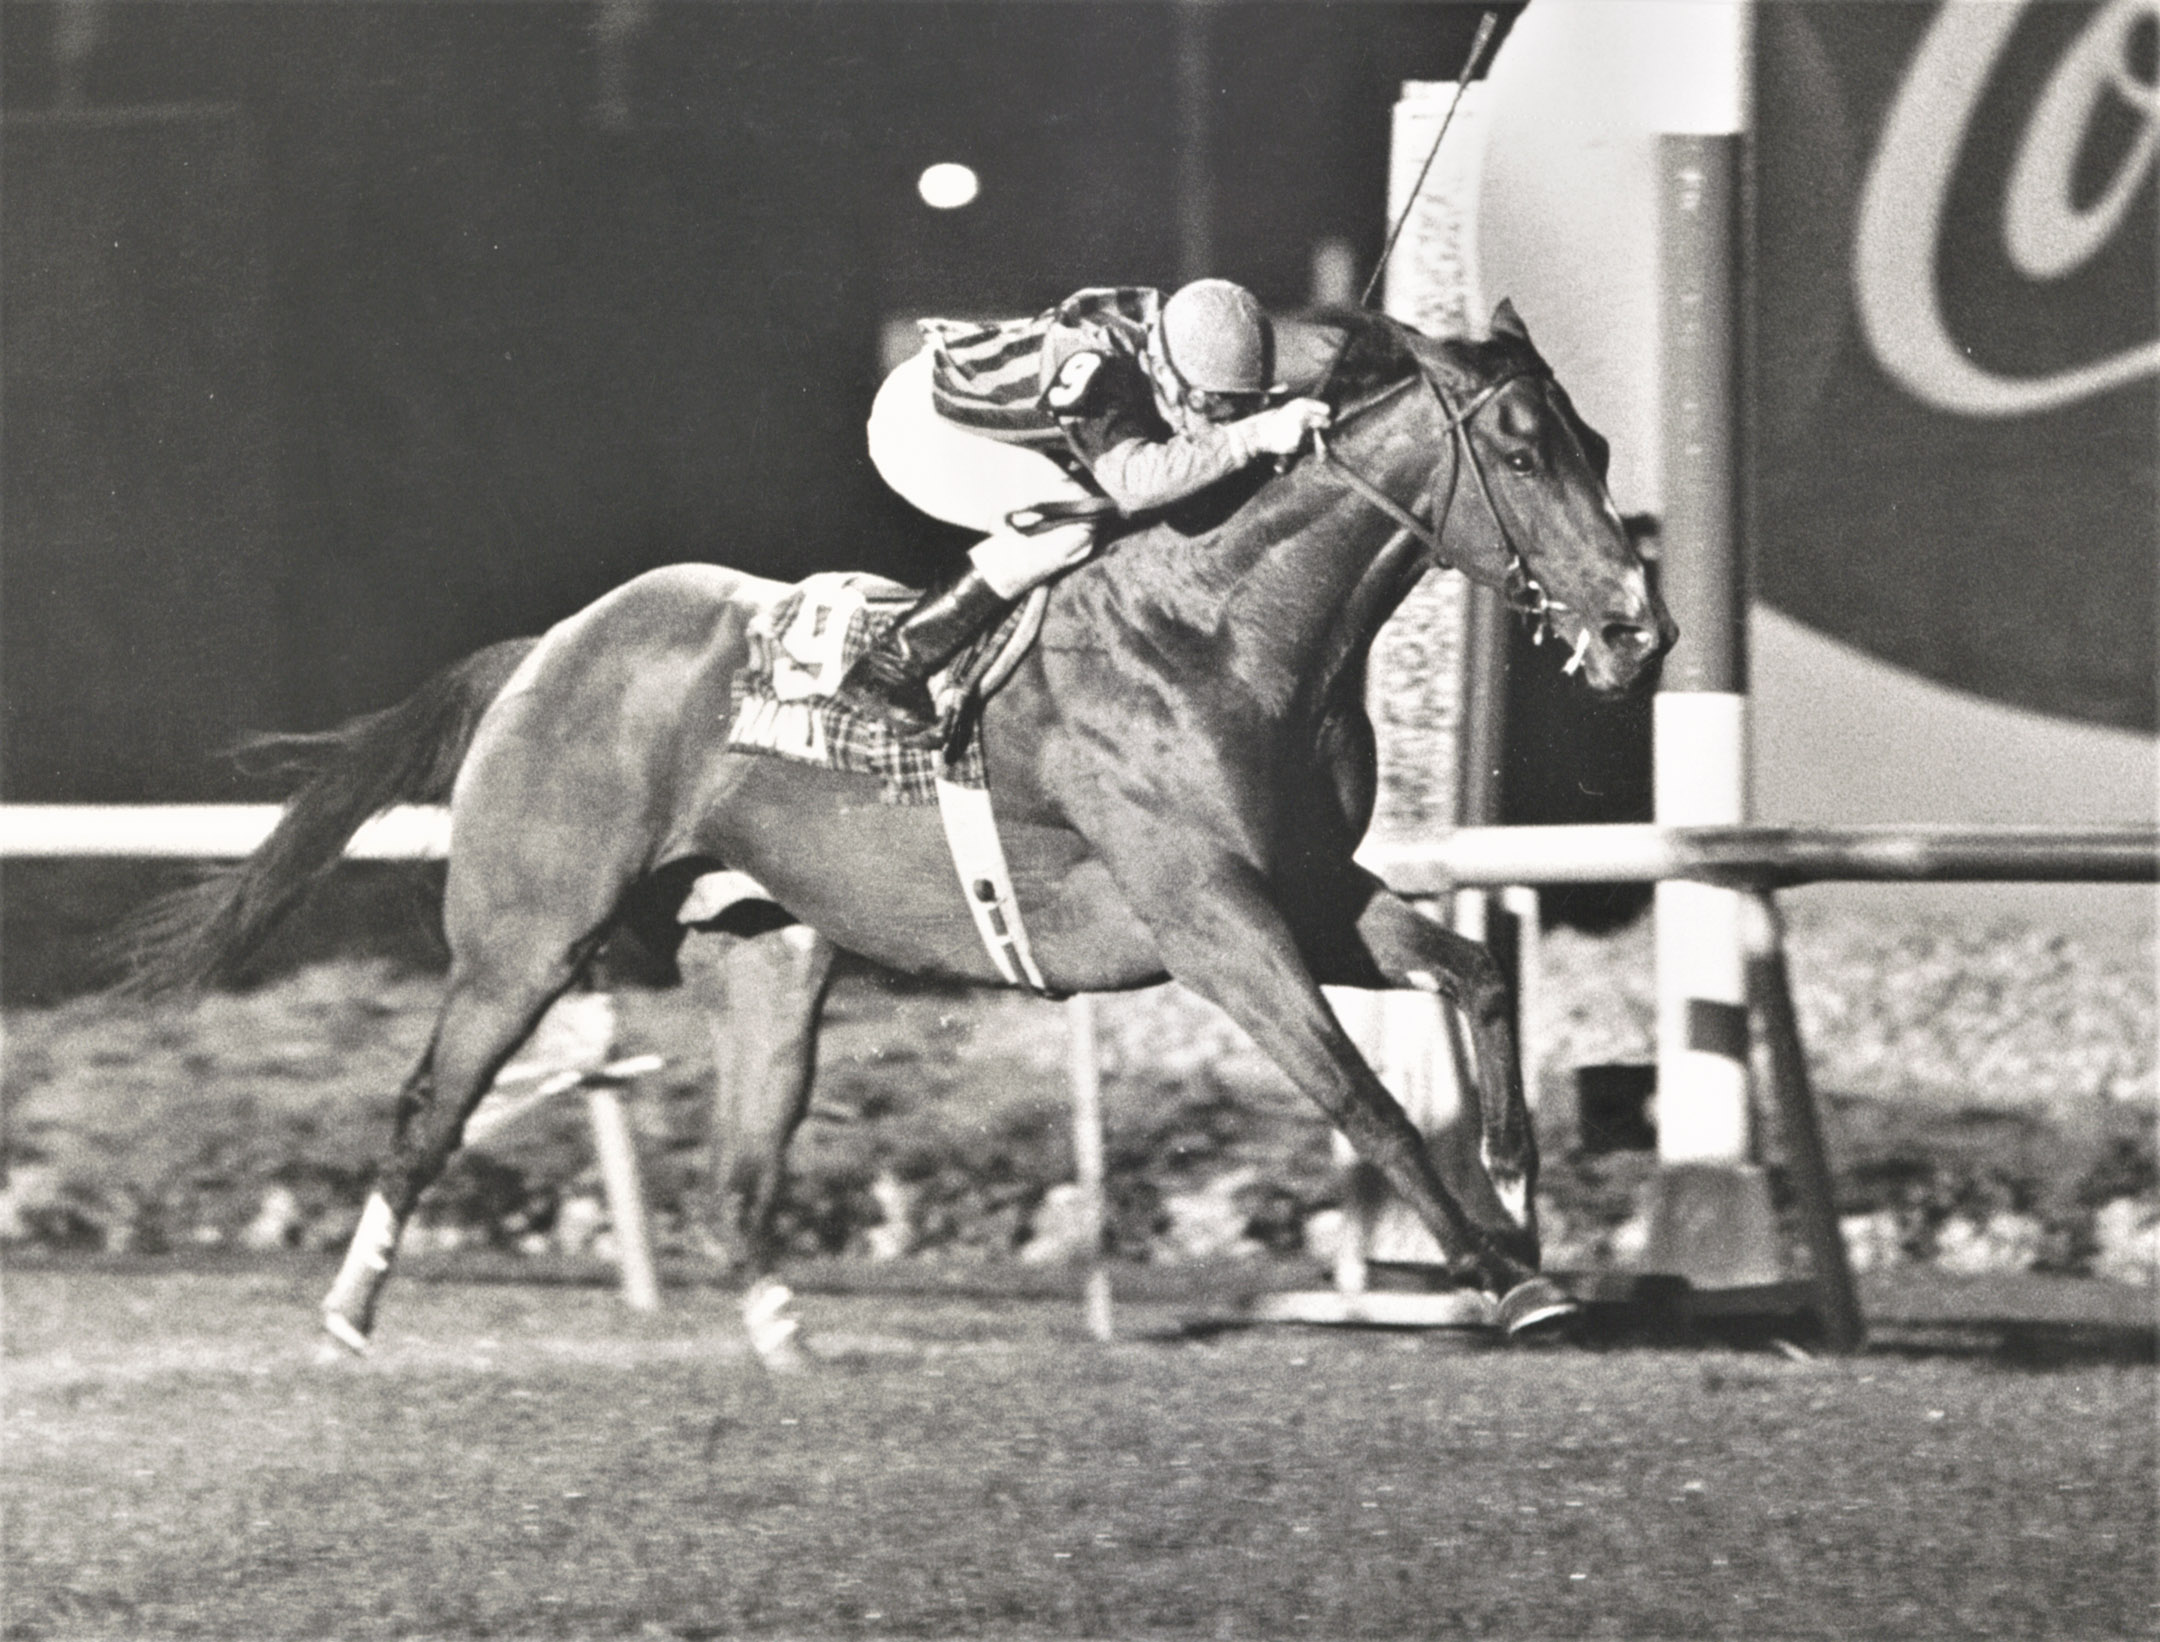 Manila (Jose Santos up) wins the 1986 Ballatine's Scotch Classic at Meadowlands (Jim Raftery Turfotos)